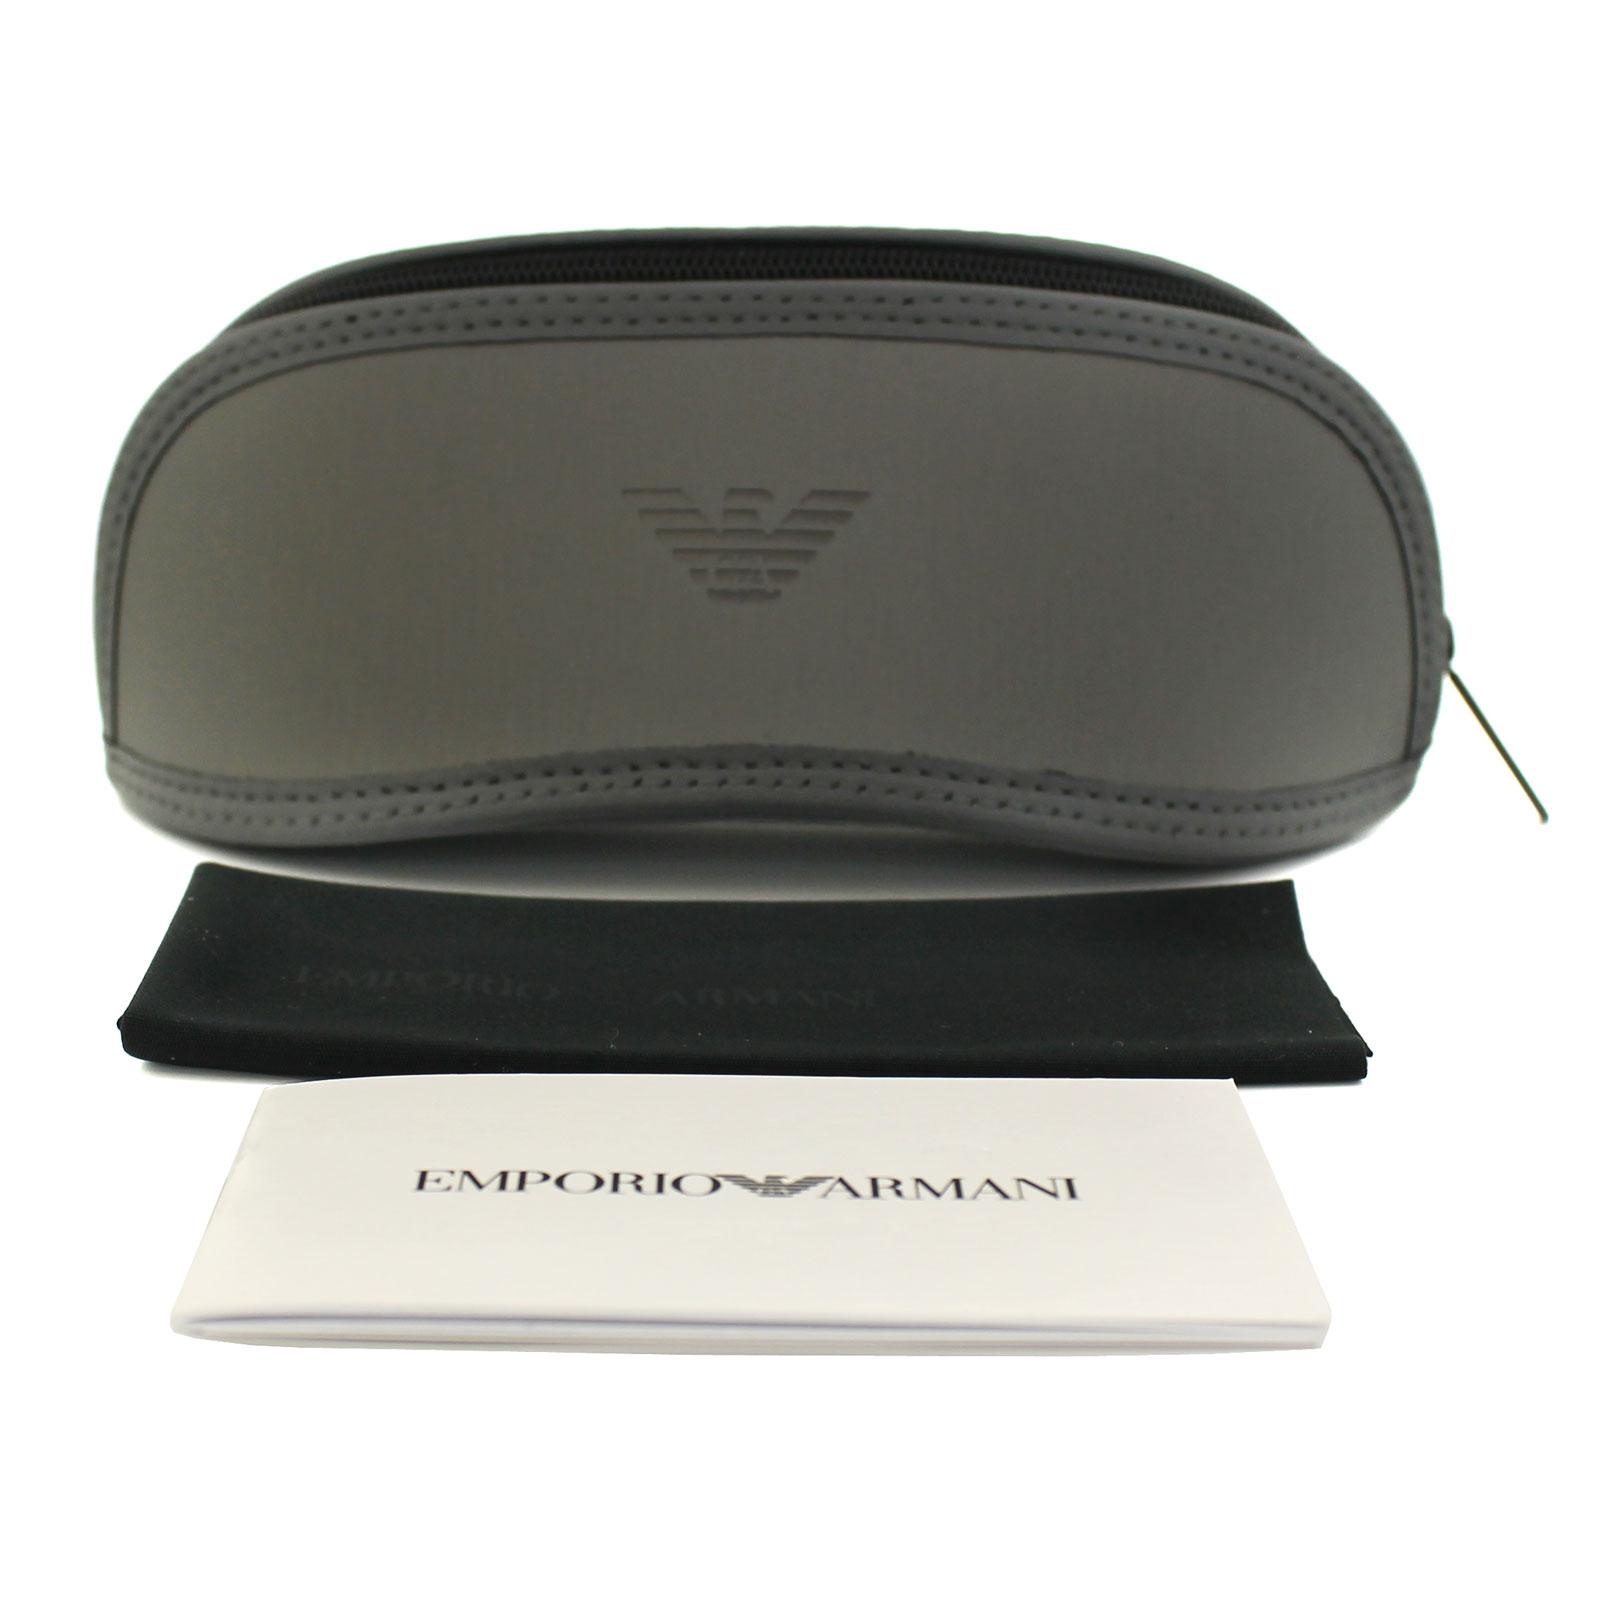 d693ceb0 Details about Emporio Armani Sunglasses EA4114 567355 Matt Electric Blue  Blue Mirror